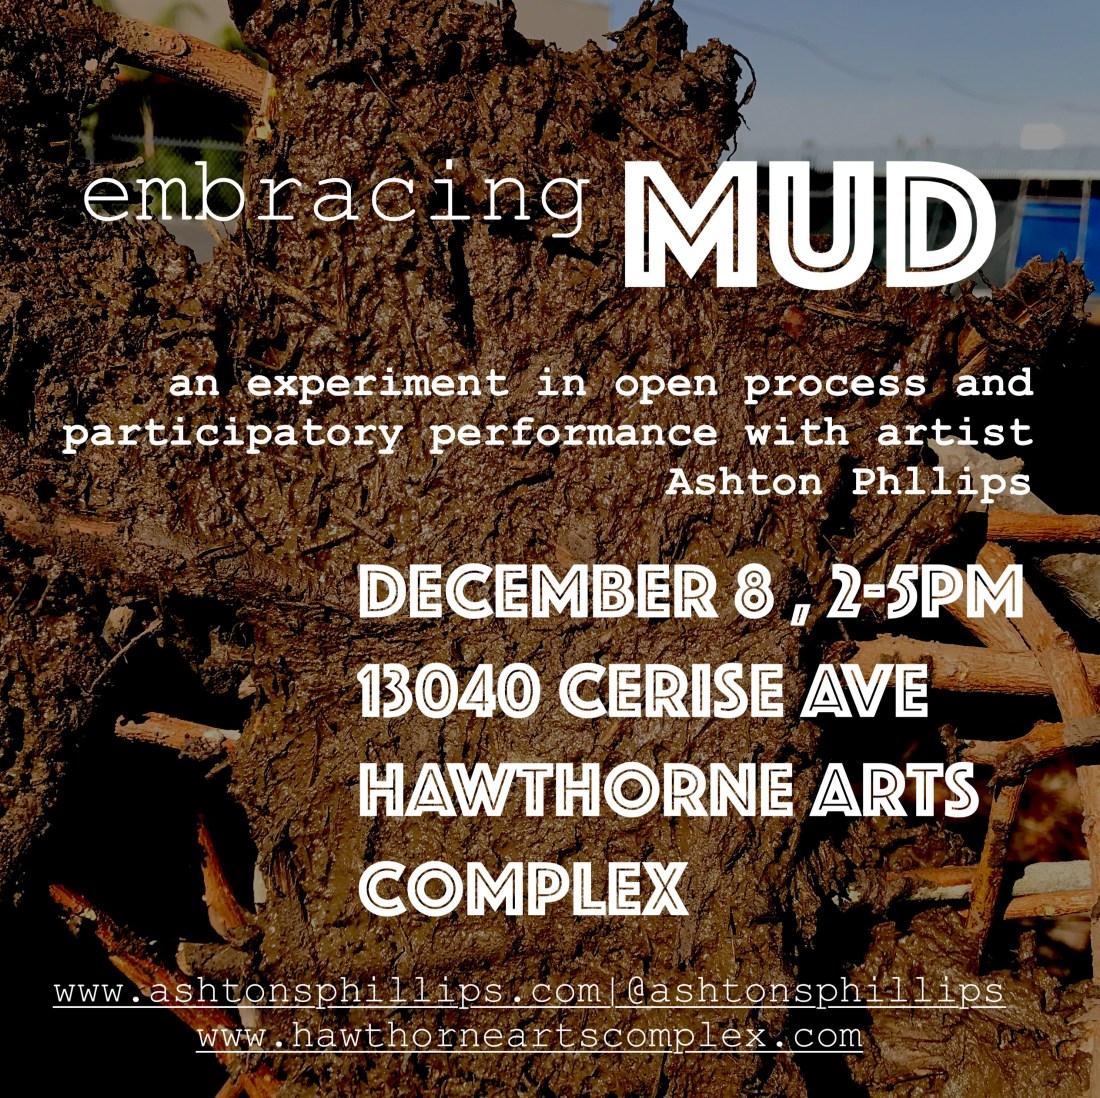 embracing MUD flyer